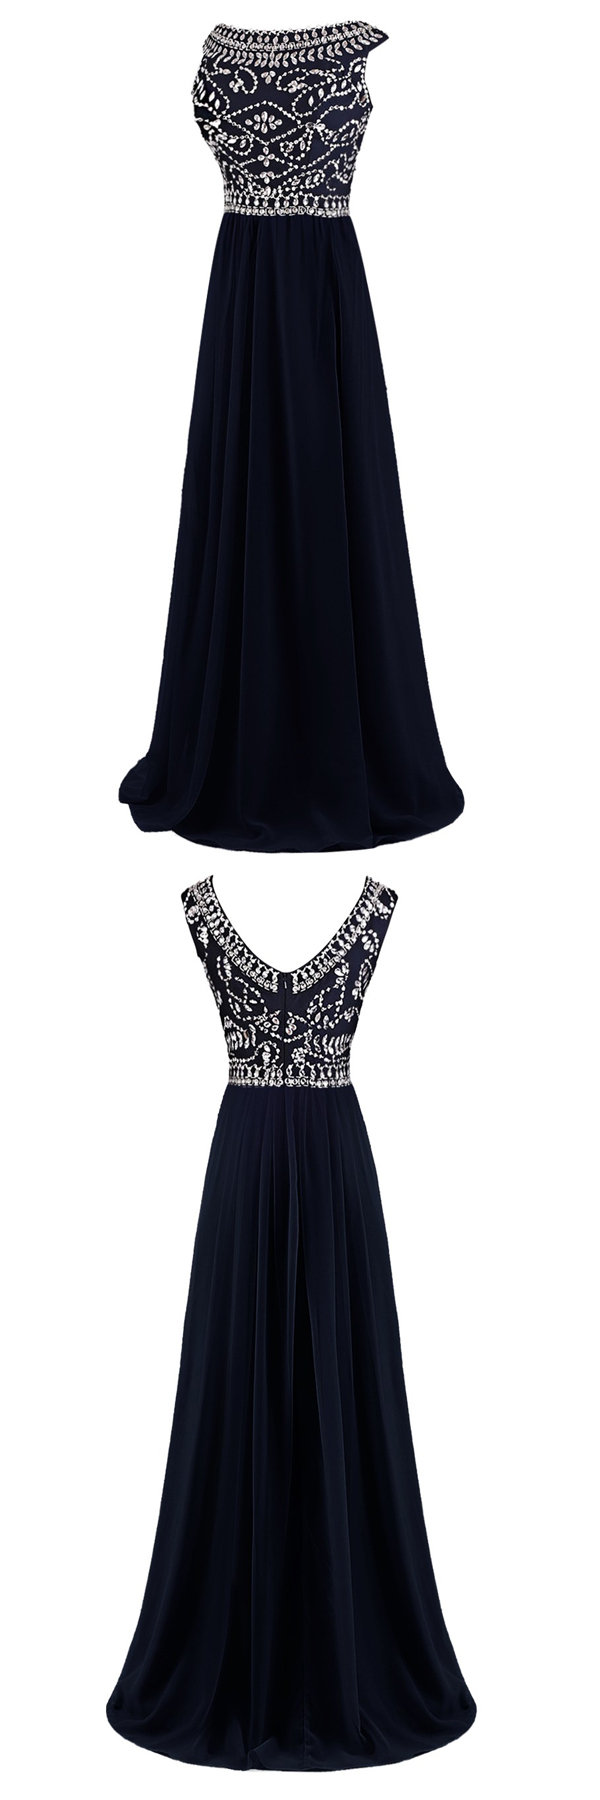 Black homecoming dress full length homecoming dress classic